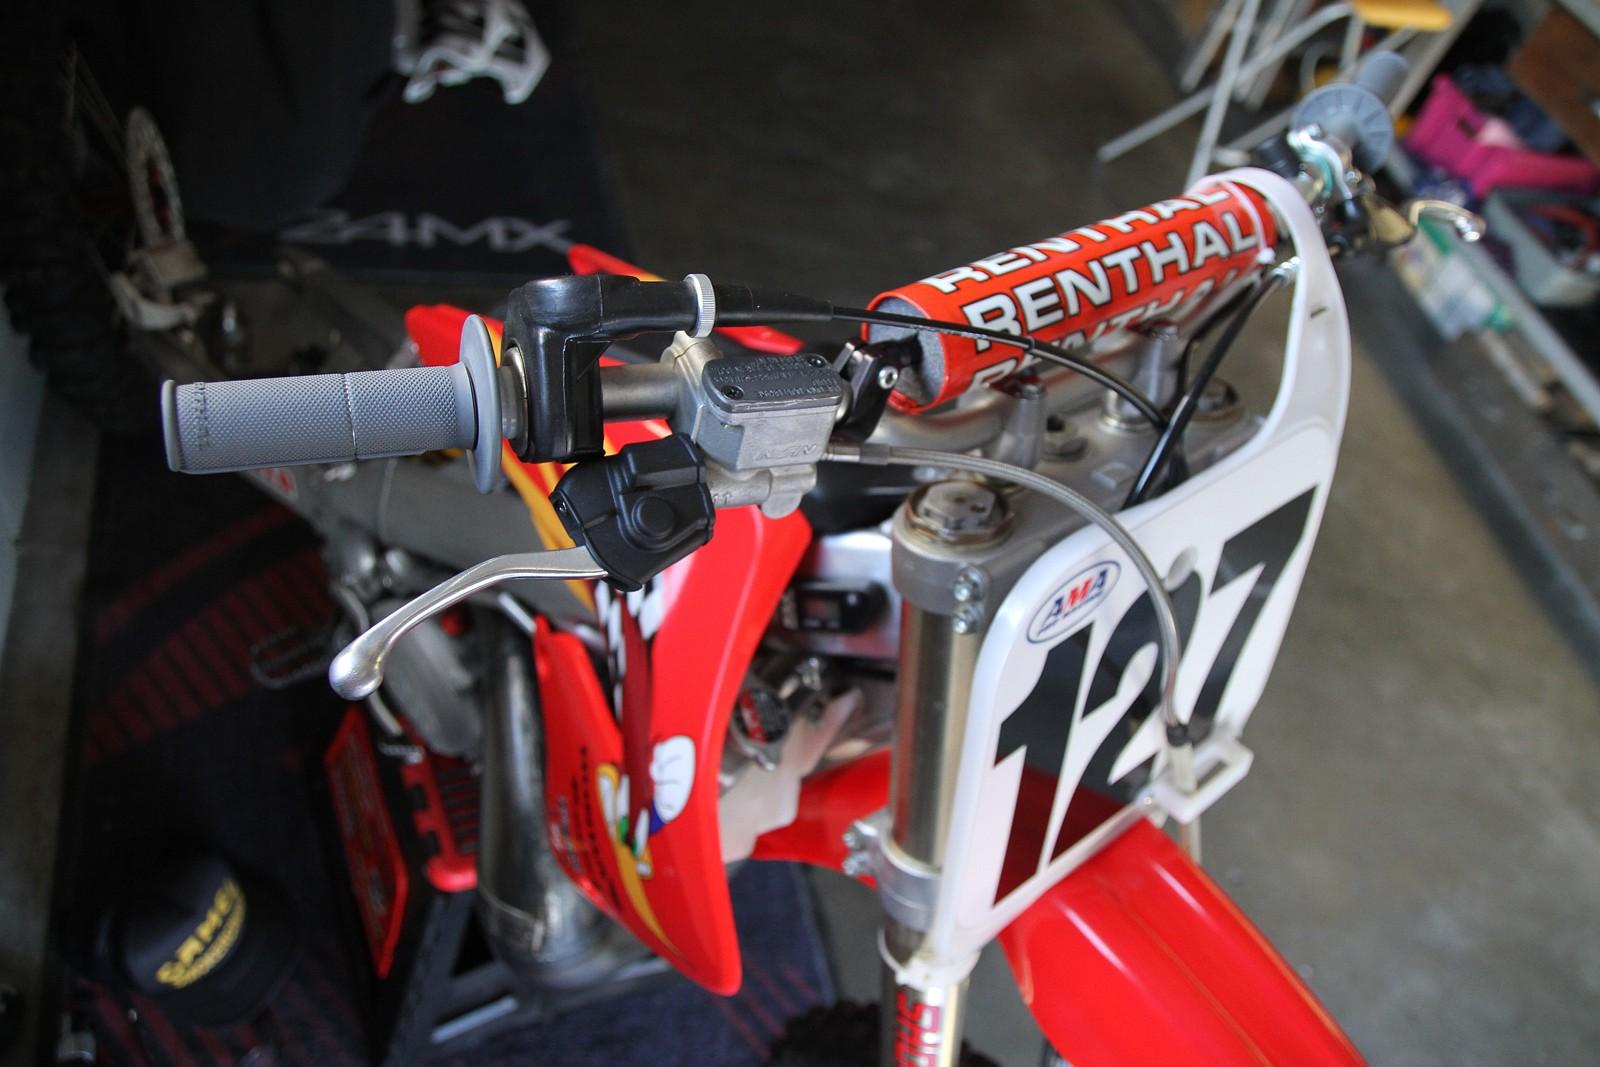 503D2C1D-77FB-49E4-B906-B9ABC515D17A - Godcho - Motocross Pictures - Vital MX